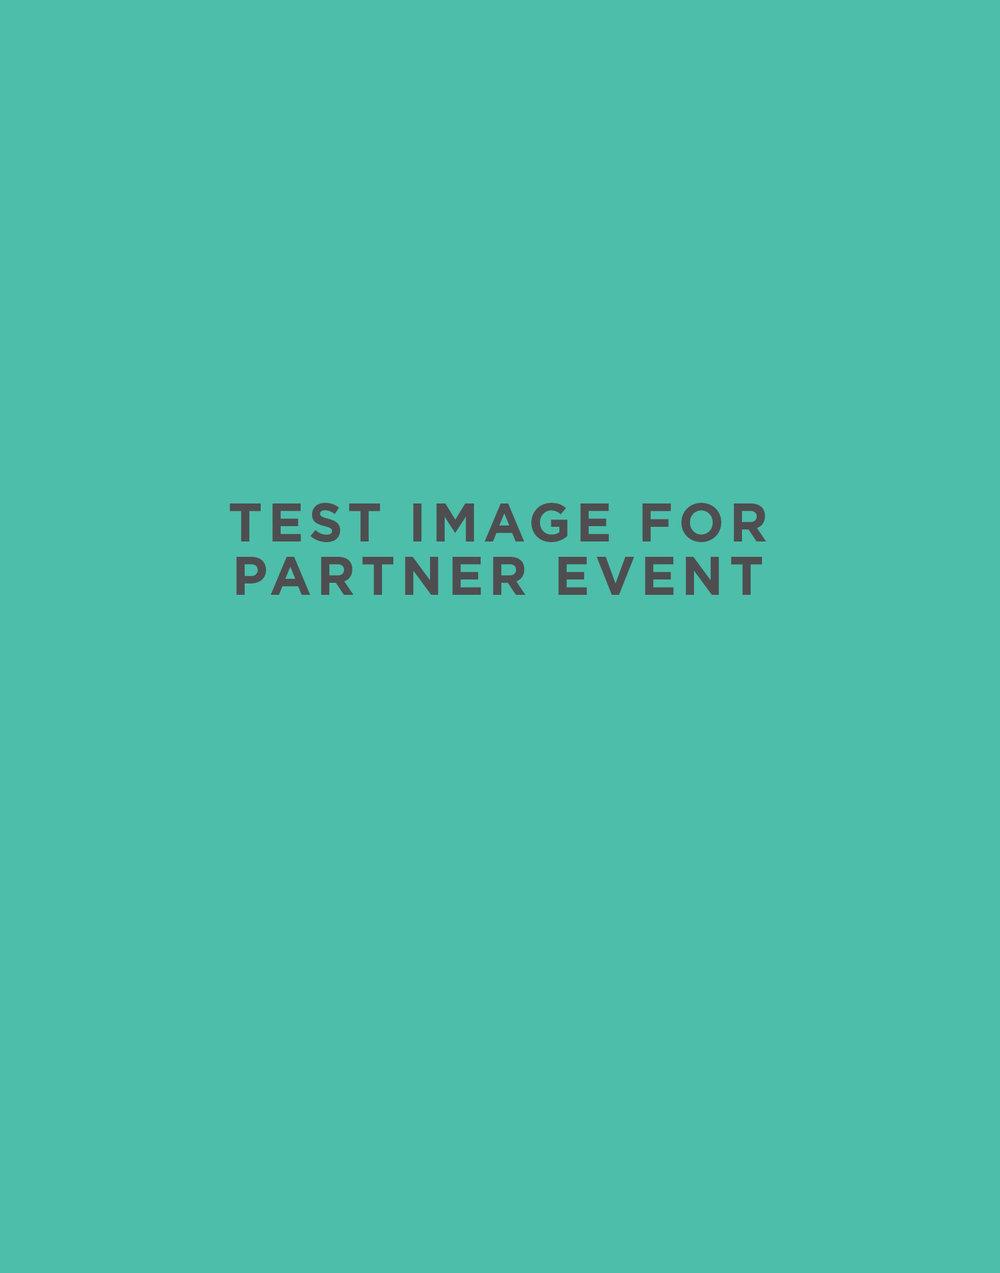 Test image for partner event.jpg